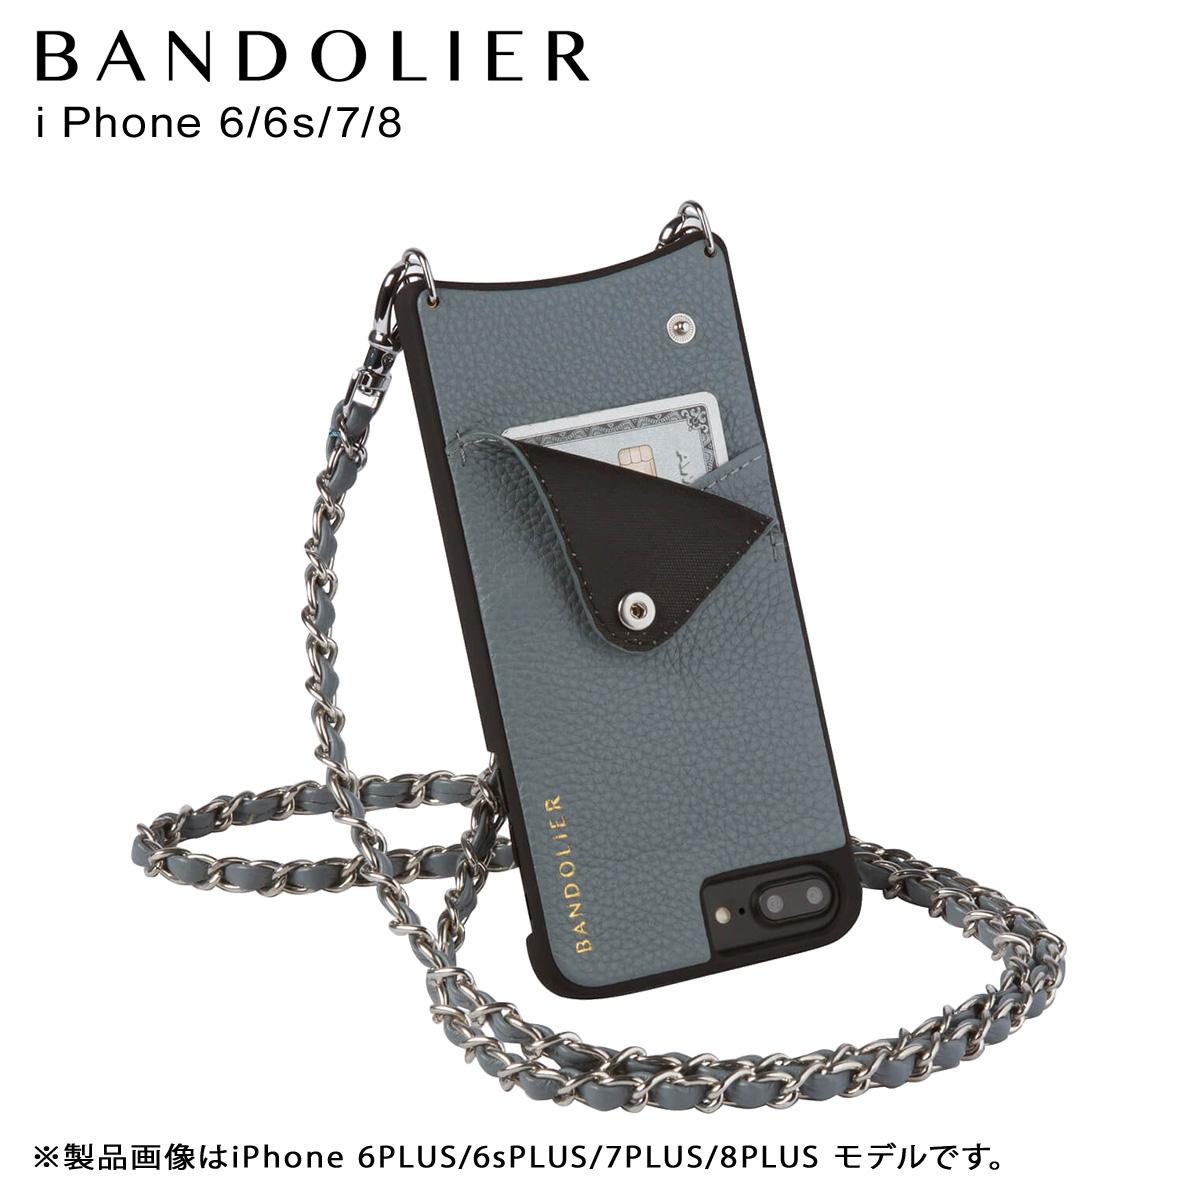 BANDOLIER iPhone8 iPhone7 6s LUCY STORM バンドリヤー ケース スマホ アイフォン メンズ レディース